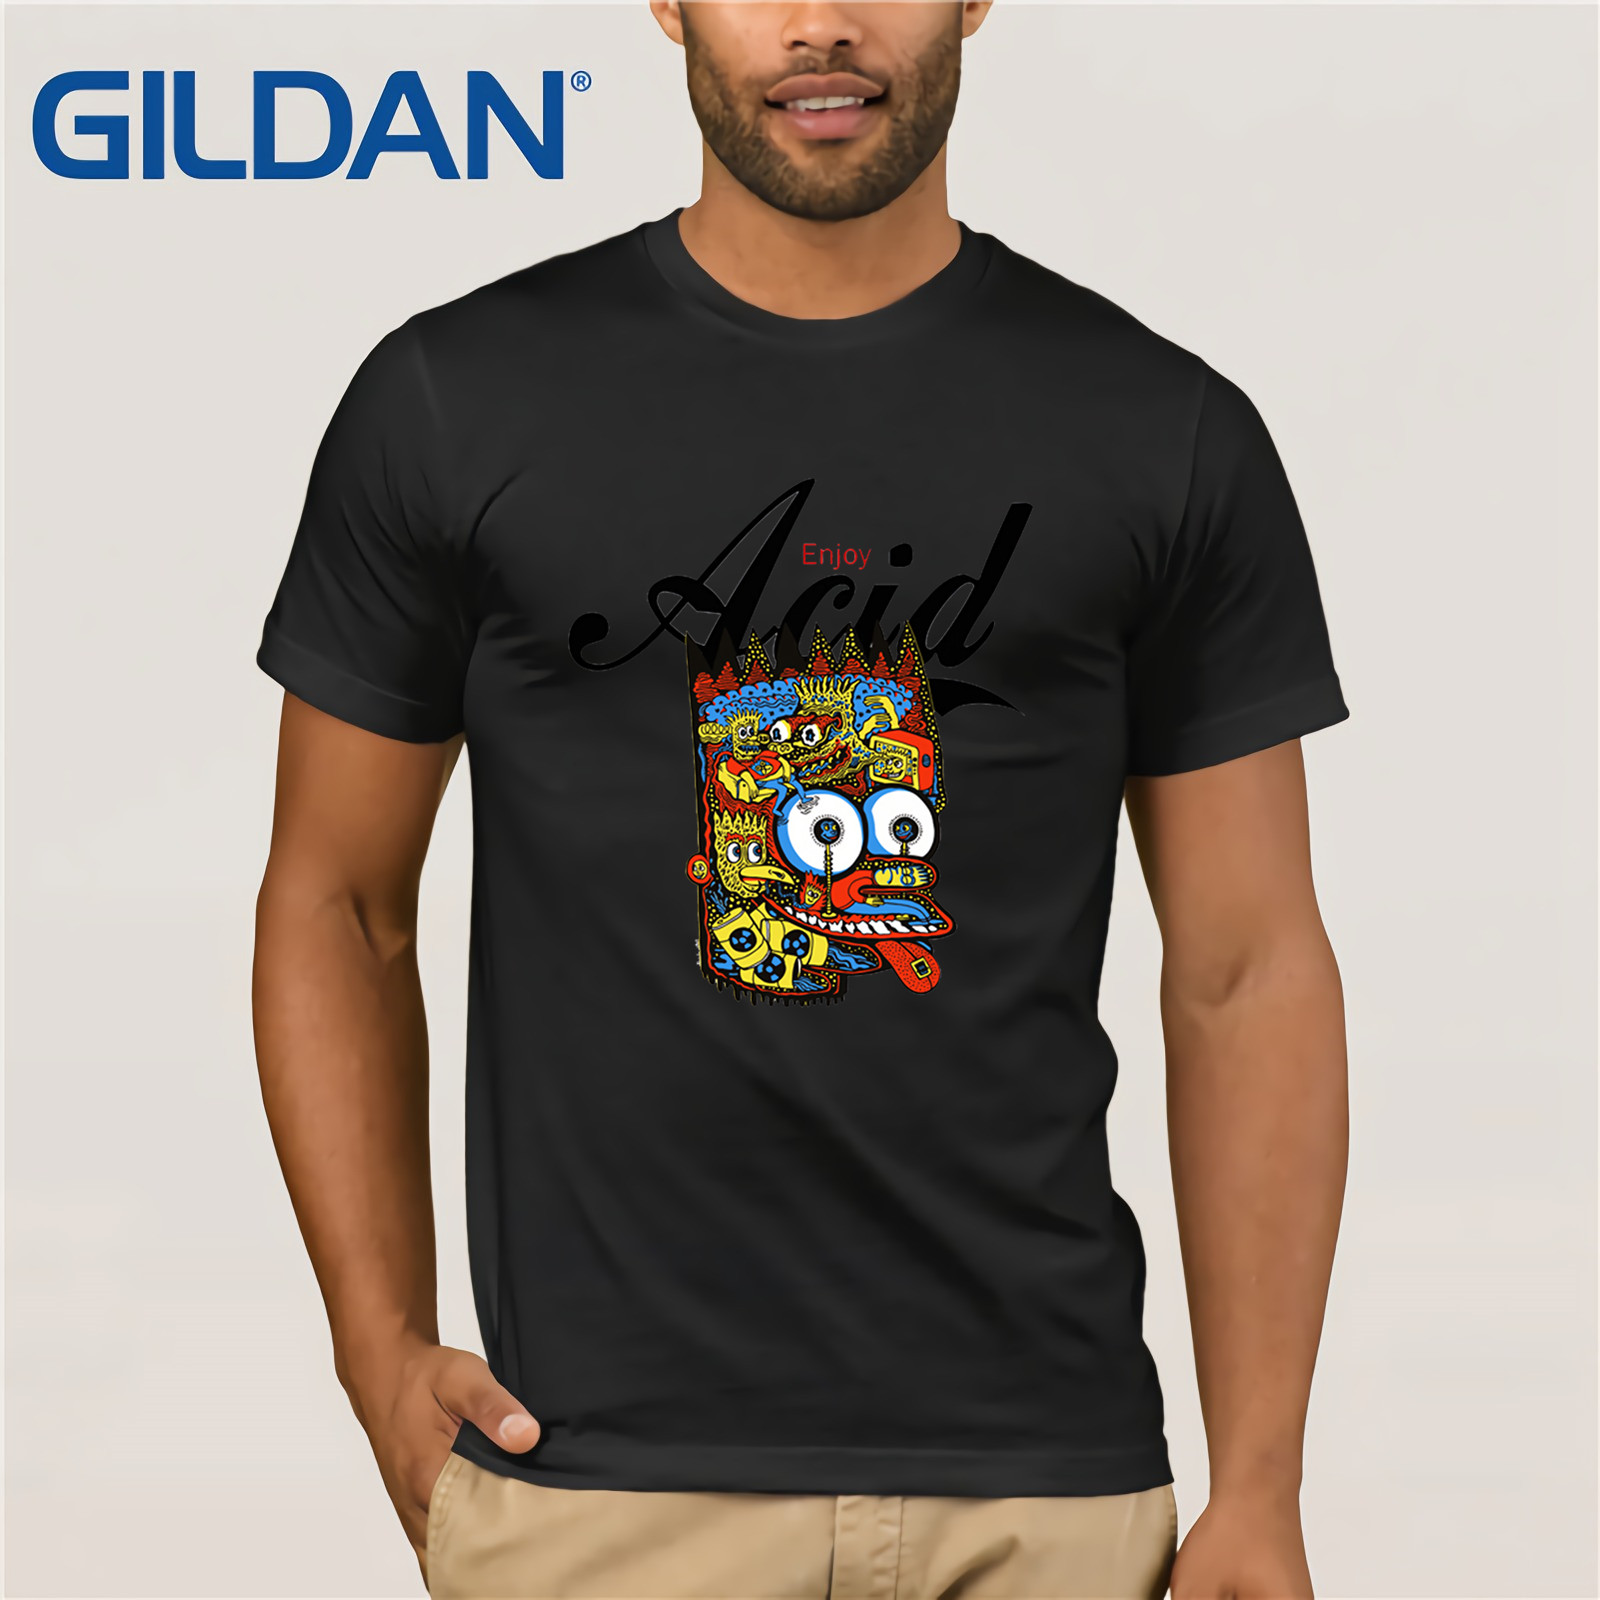 Selfless T Shirt Enjoy Acid Lsd Meskalin 2c B Al Lad Dmt Meo 3457 Cool Casual Pride T Shirt Men Unisex New Fashion Tshirt Loose Fine Quality T-shirts Tops & Tees